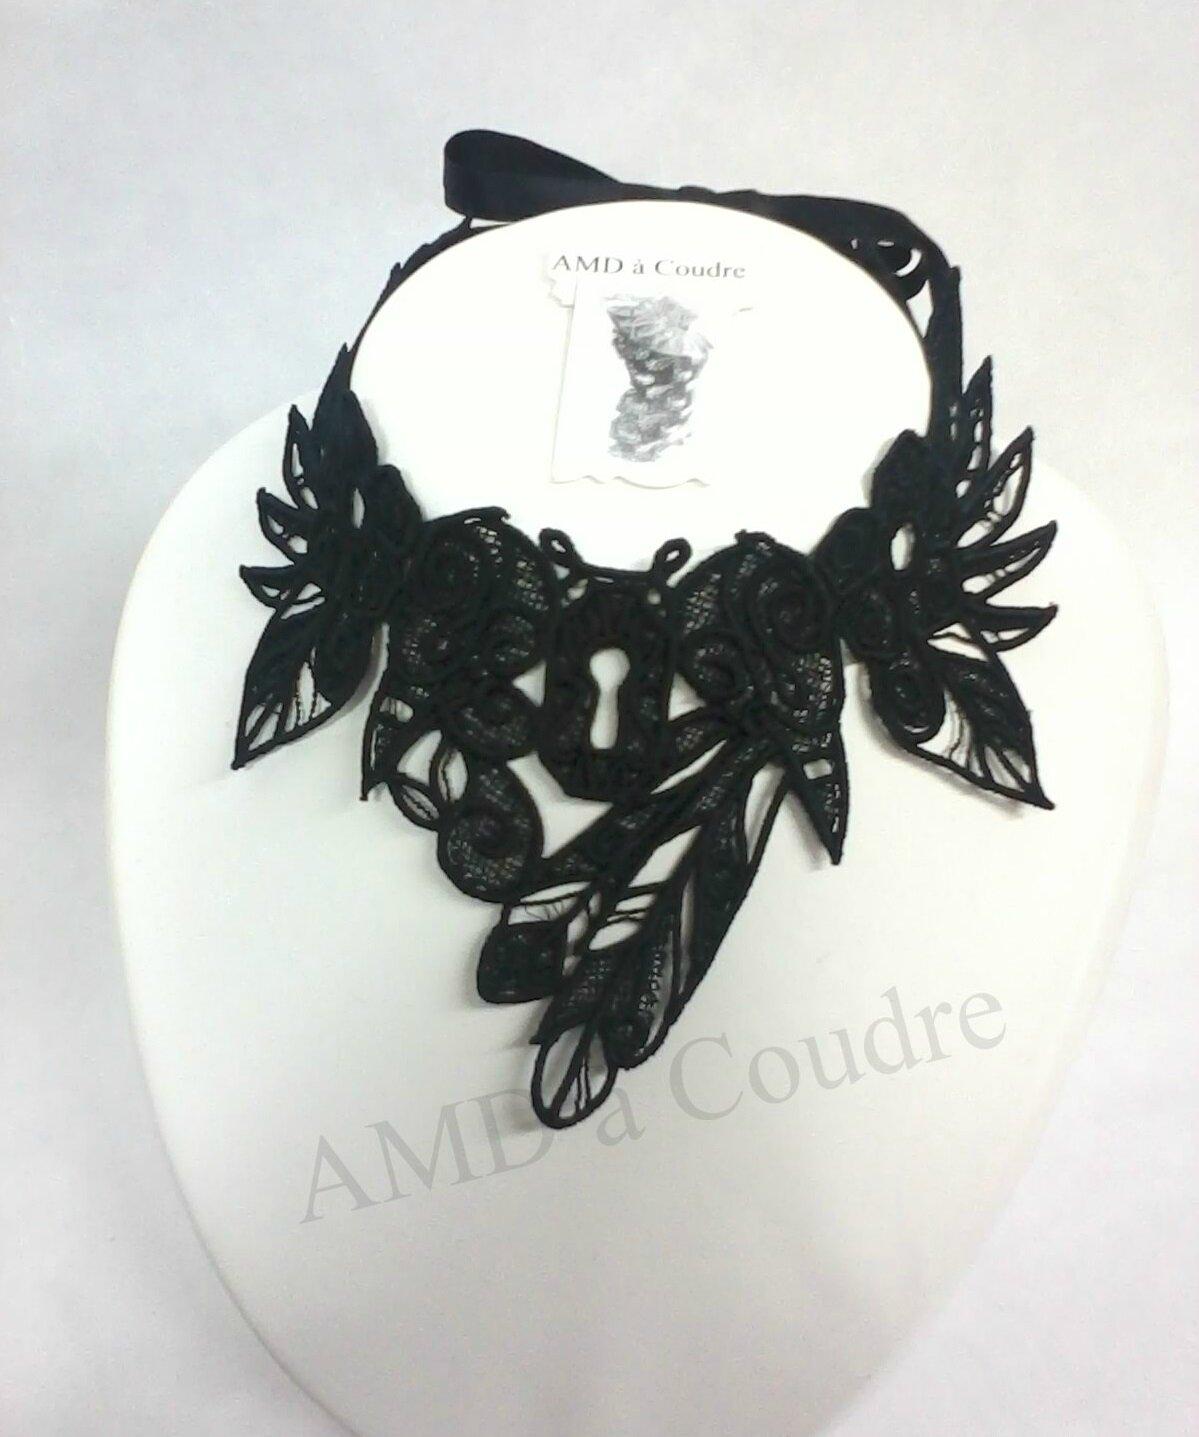 tour de cou, chocker dentelle noire broderie embroidery by amd a coudre (1)-001